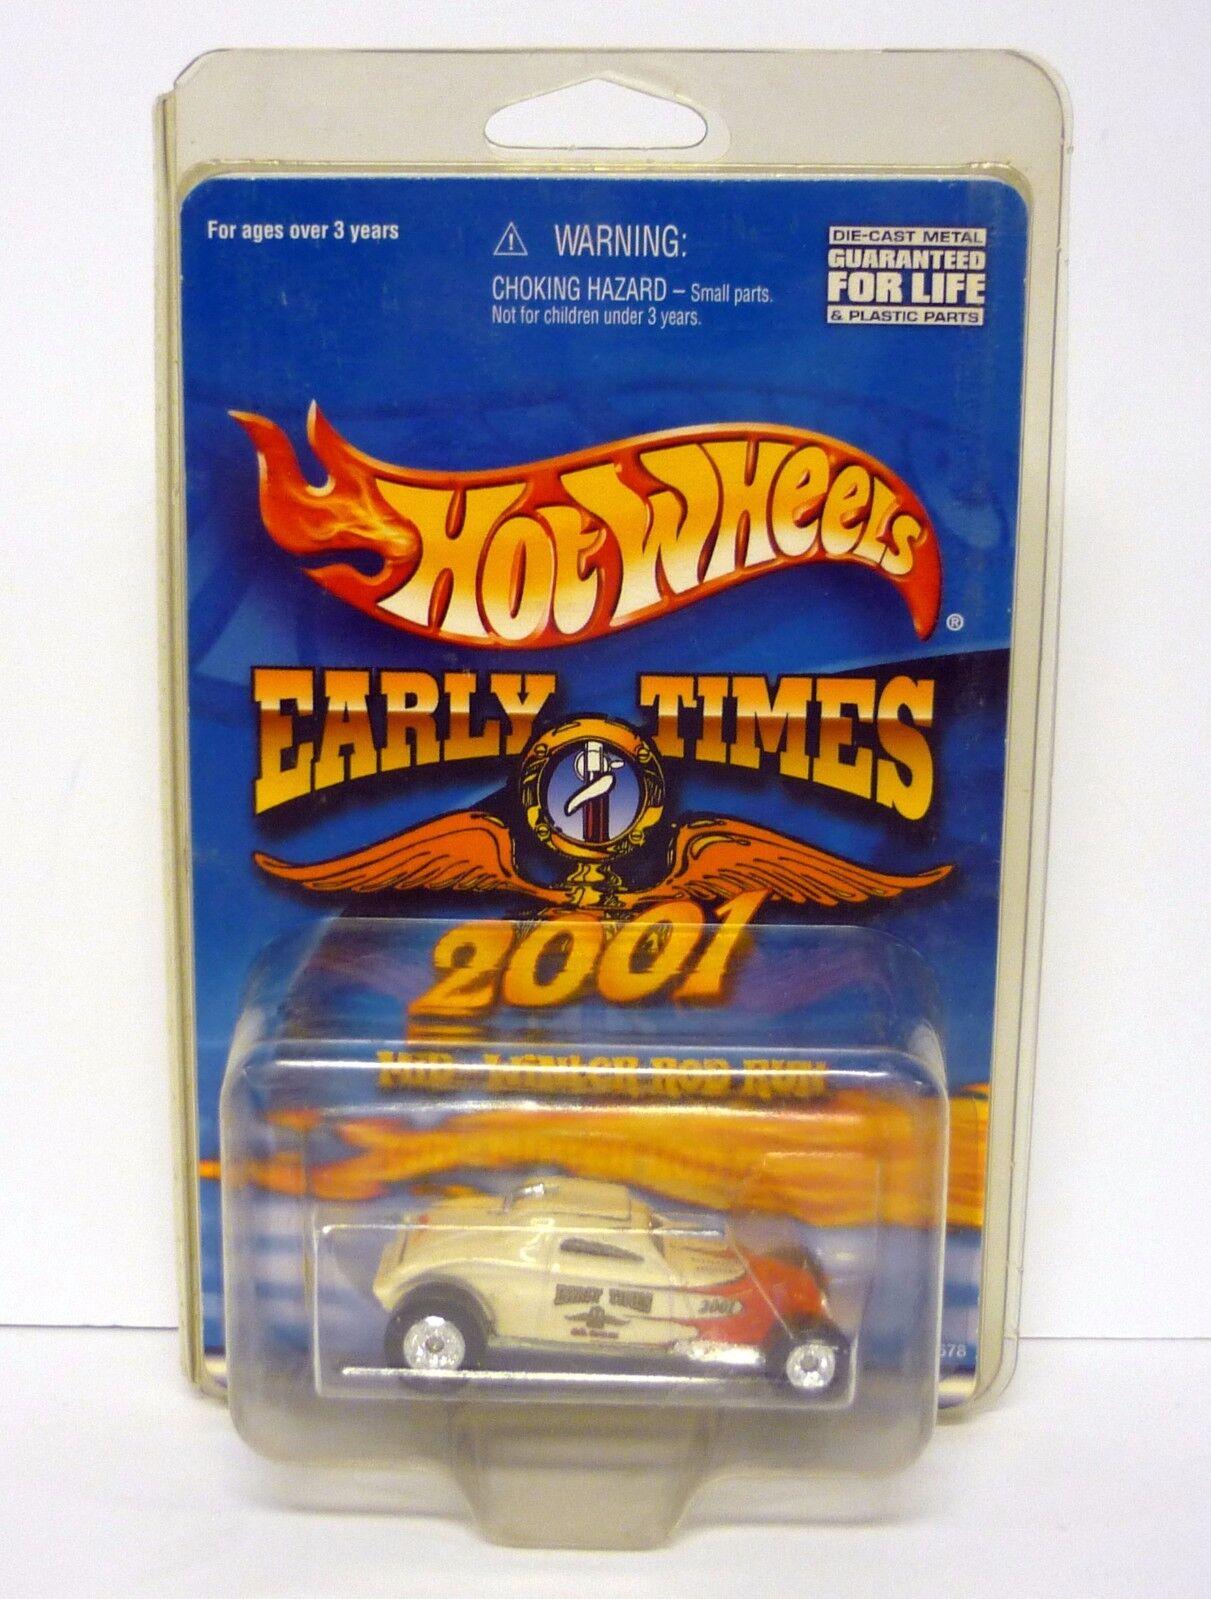 Hot Wheels Mid-Winter Vara Correr so so so Fast 2001 Early Times de Metal Moc Completo  descuento online